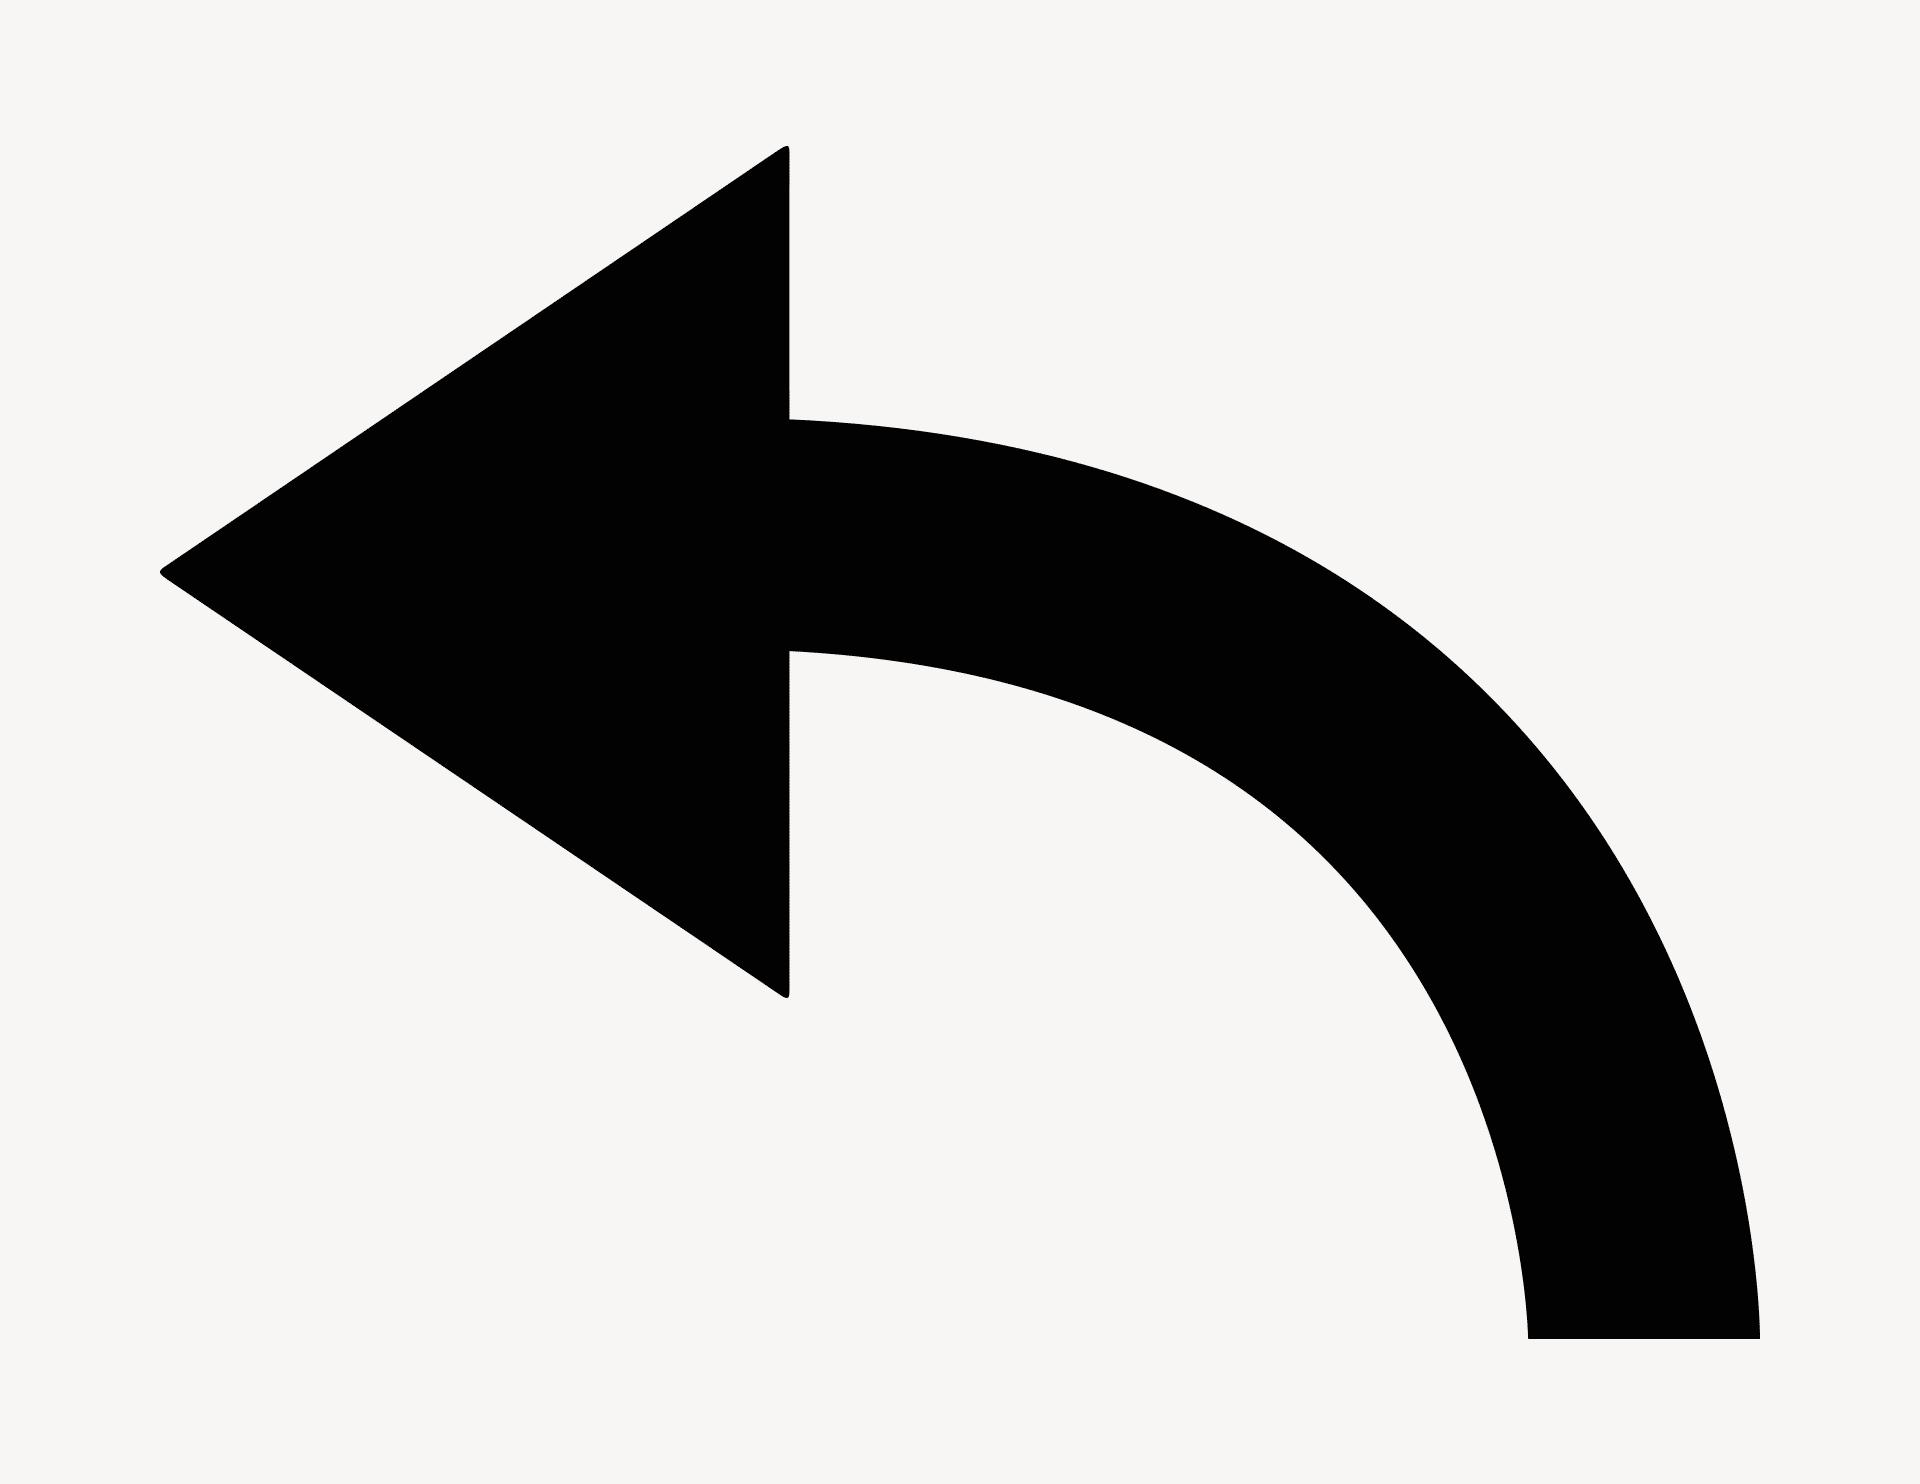 Pfeil Finn-Bogen links - Aufkleber für Gewerbe